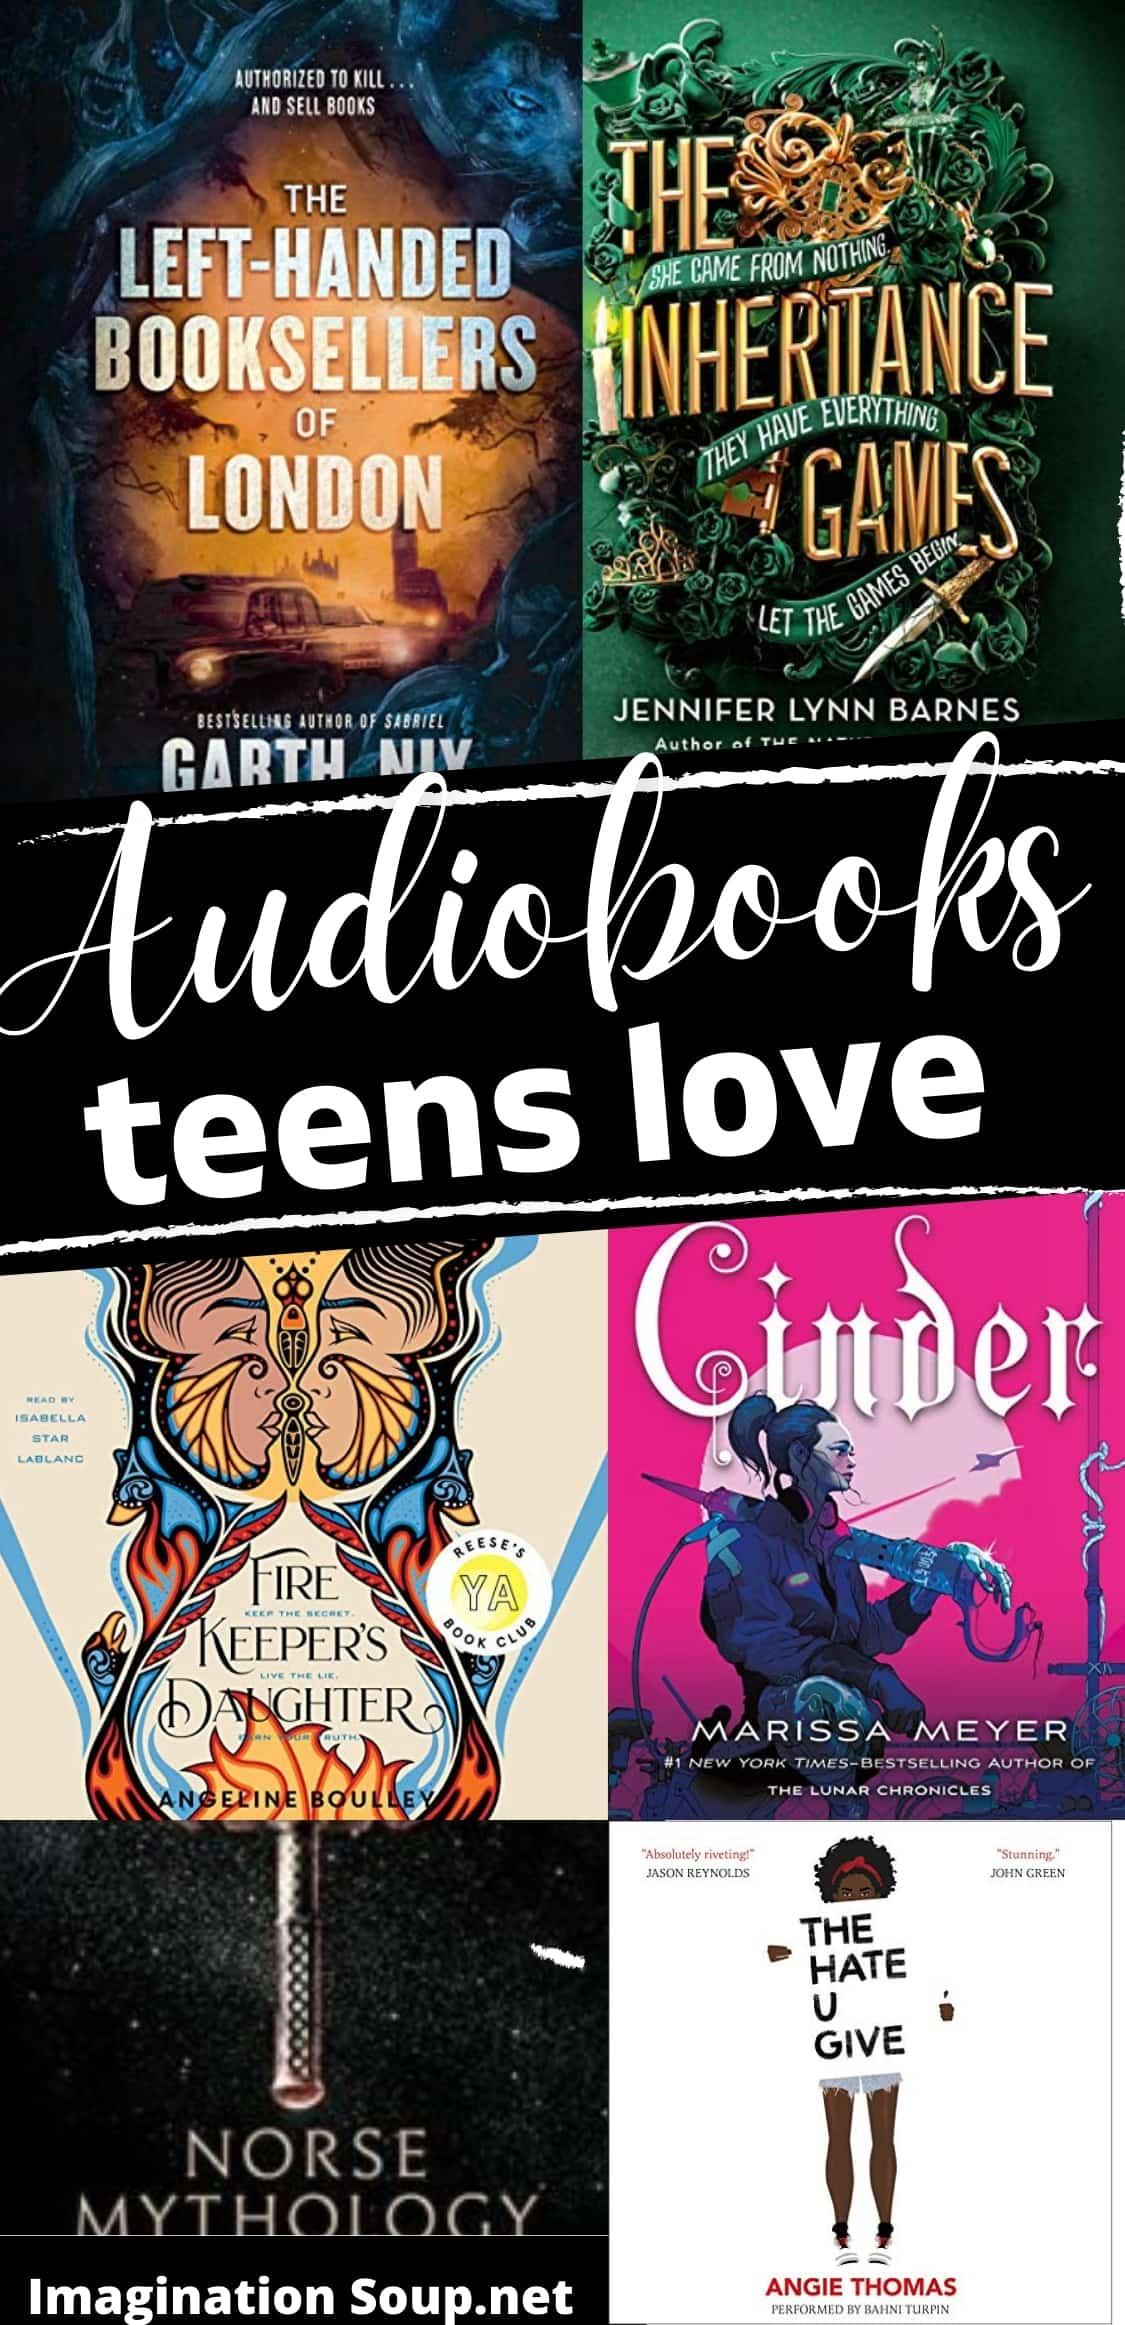 Best YA audiobooks for teens